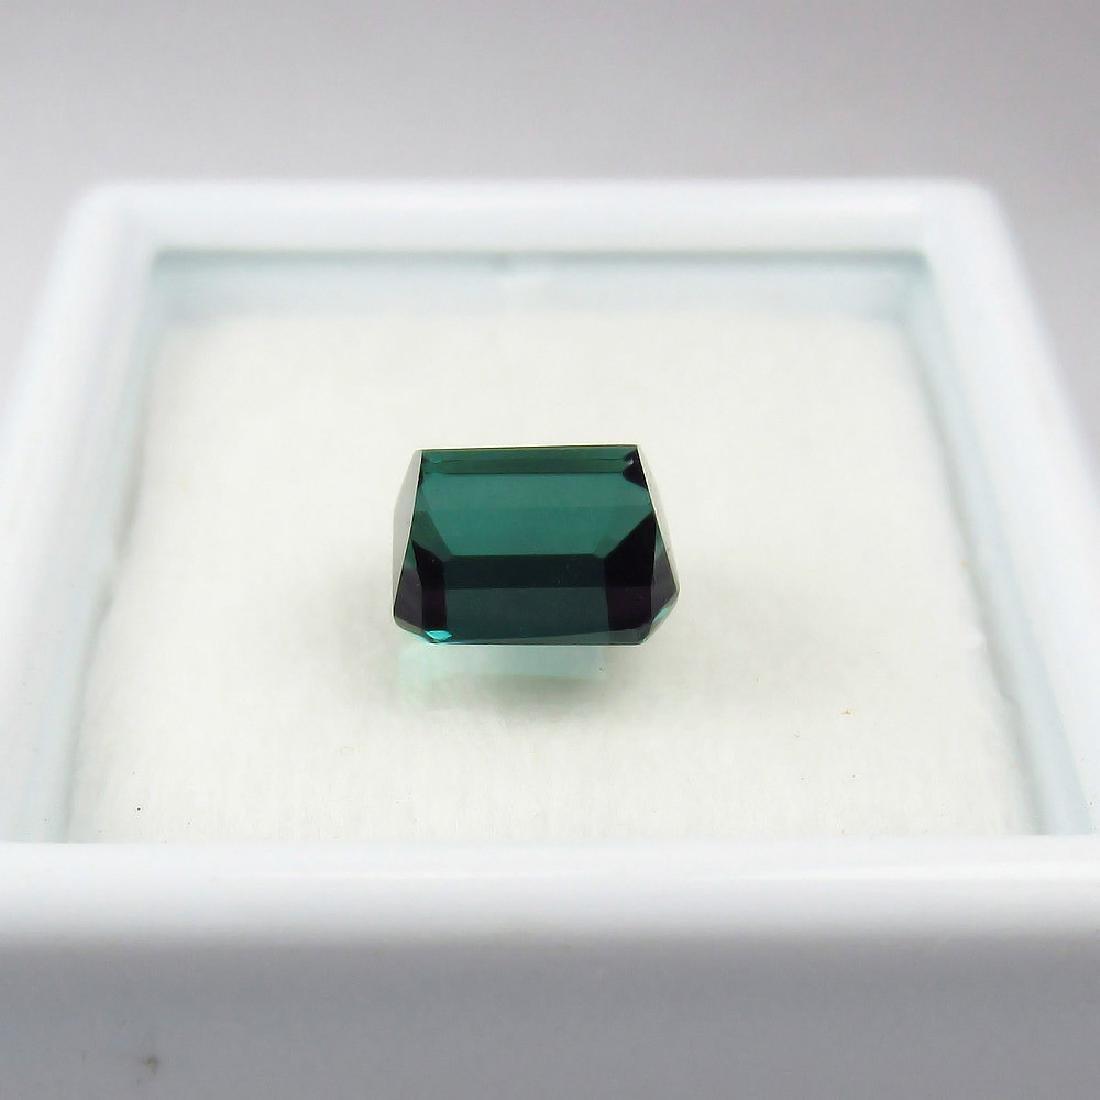 1.55 Ct Genuine Loose Green Tourmaline Full Luster - 2